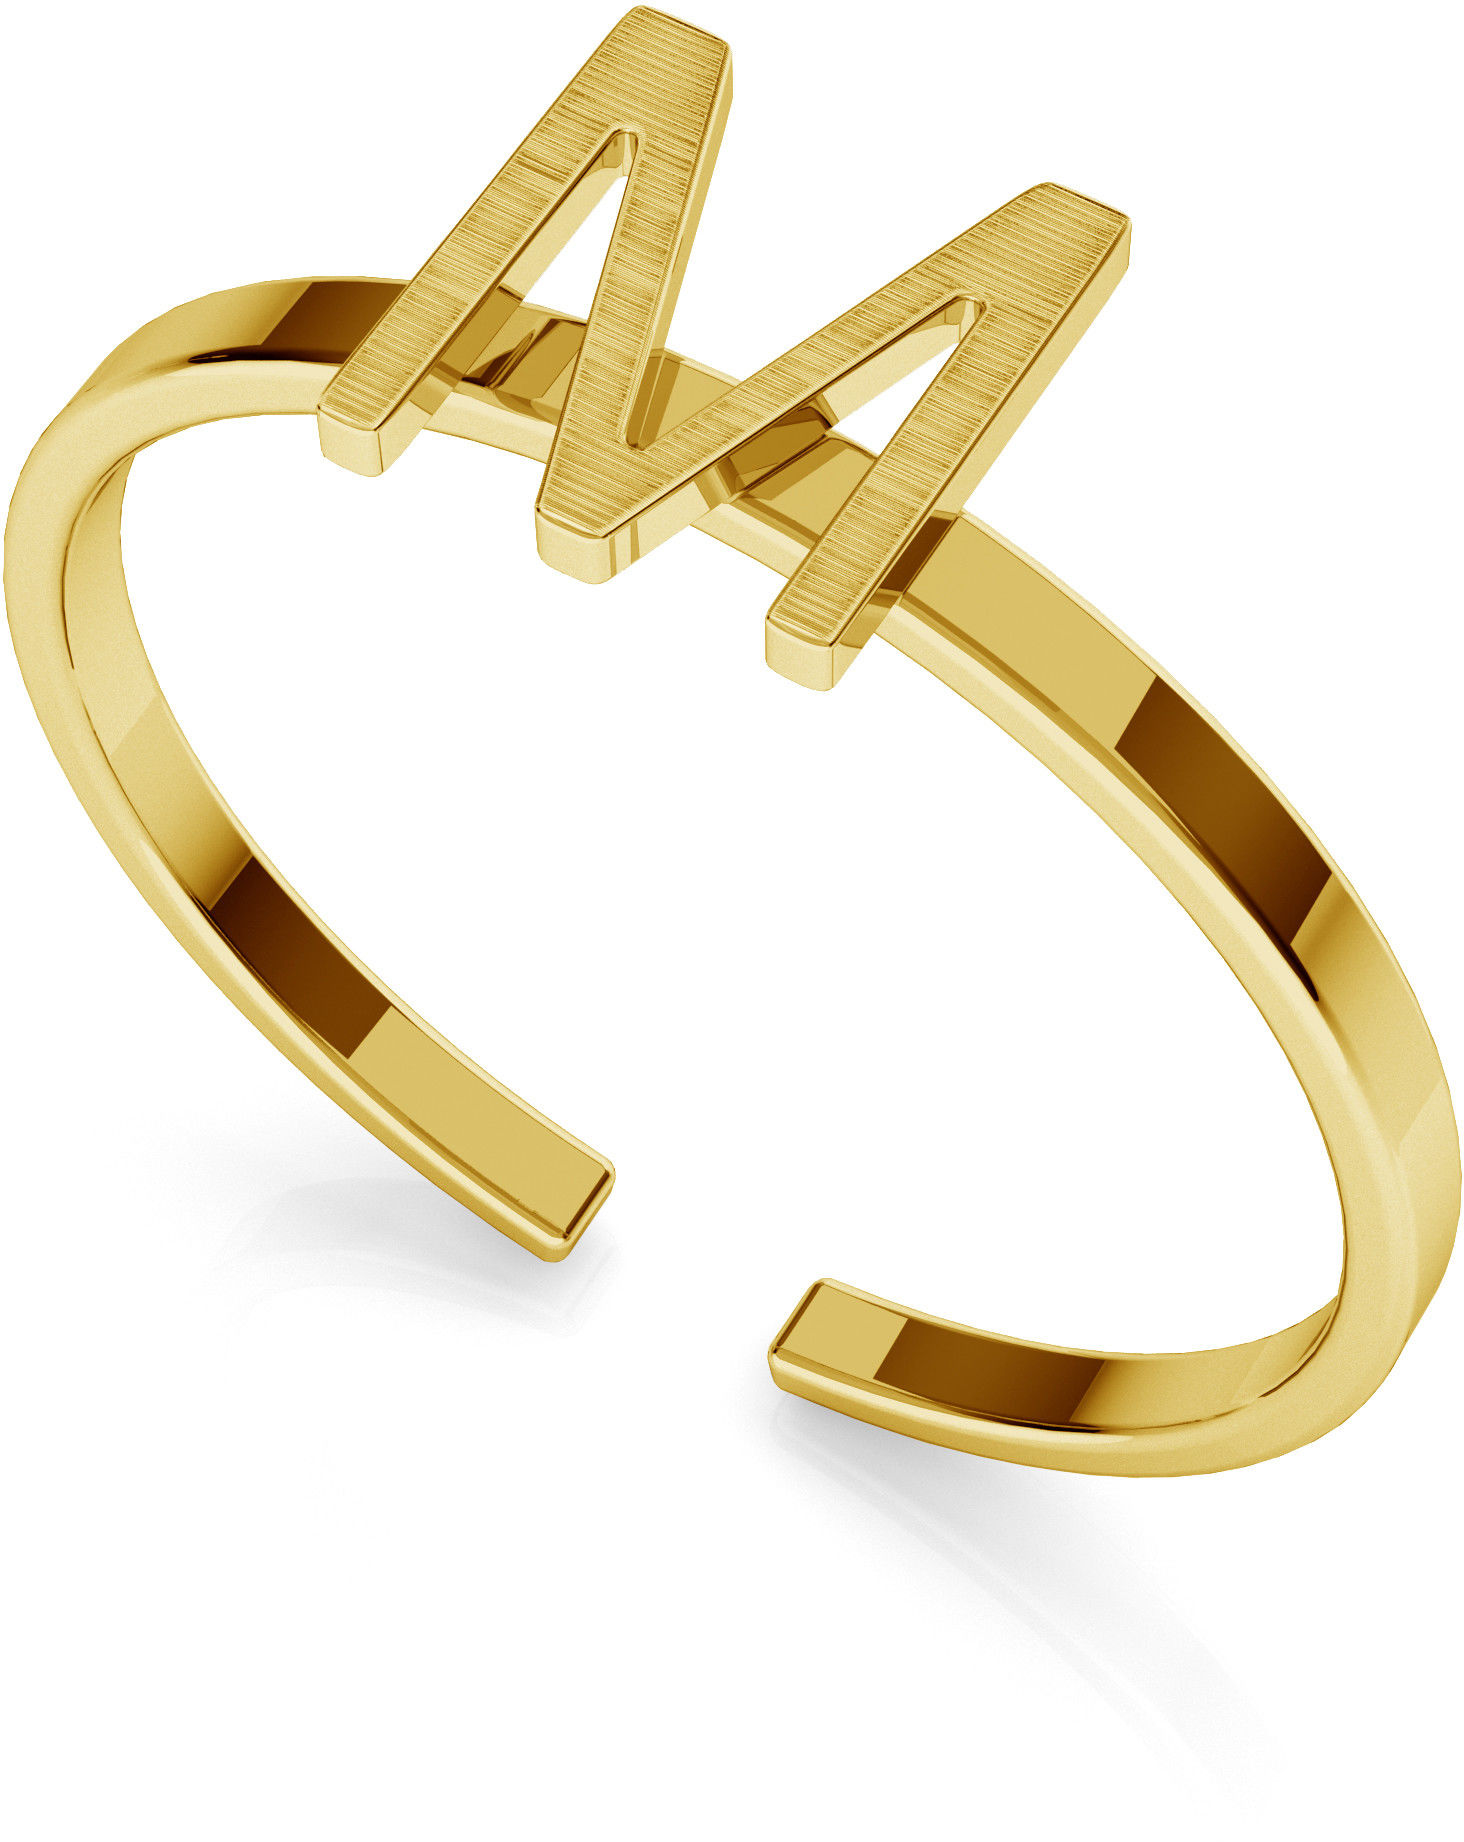 Srebrny pierścionek z literką My RING, srebro 925 : Litera - R, Srebro - kolor pokrycia - Pokrycie platyną